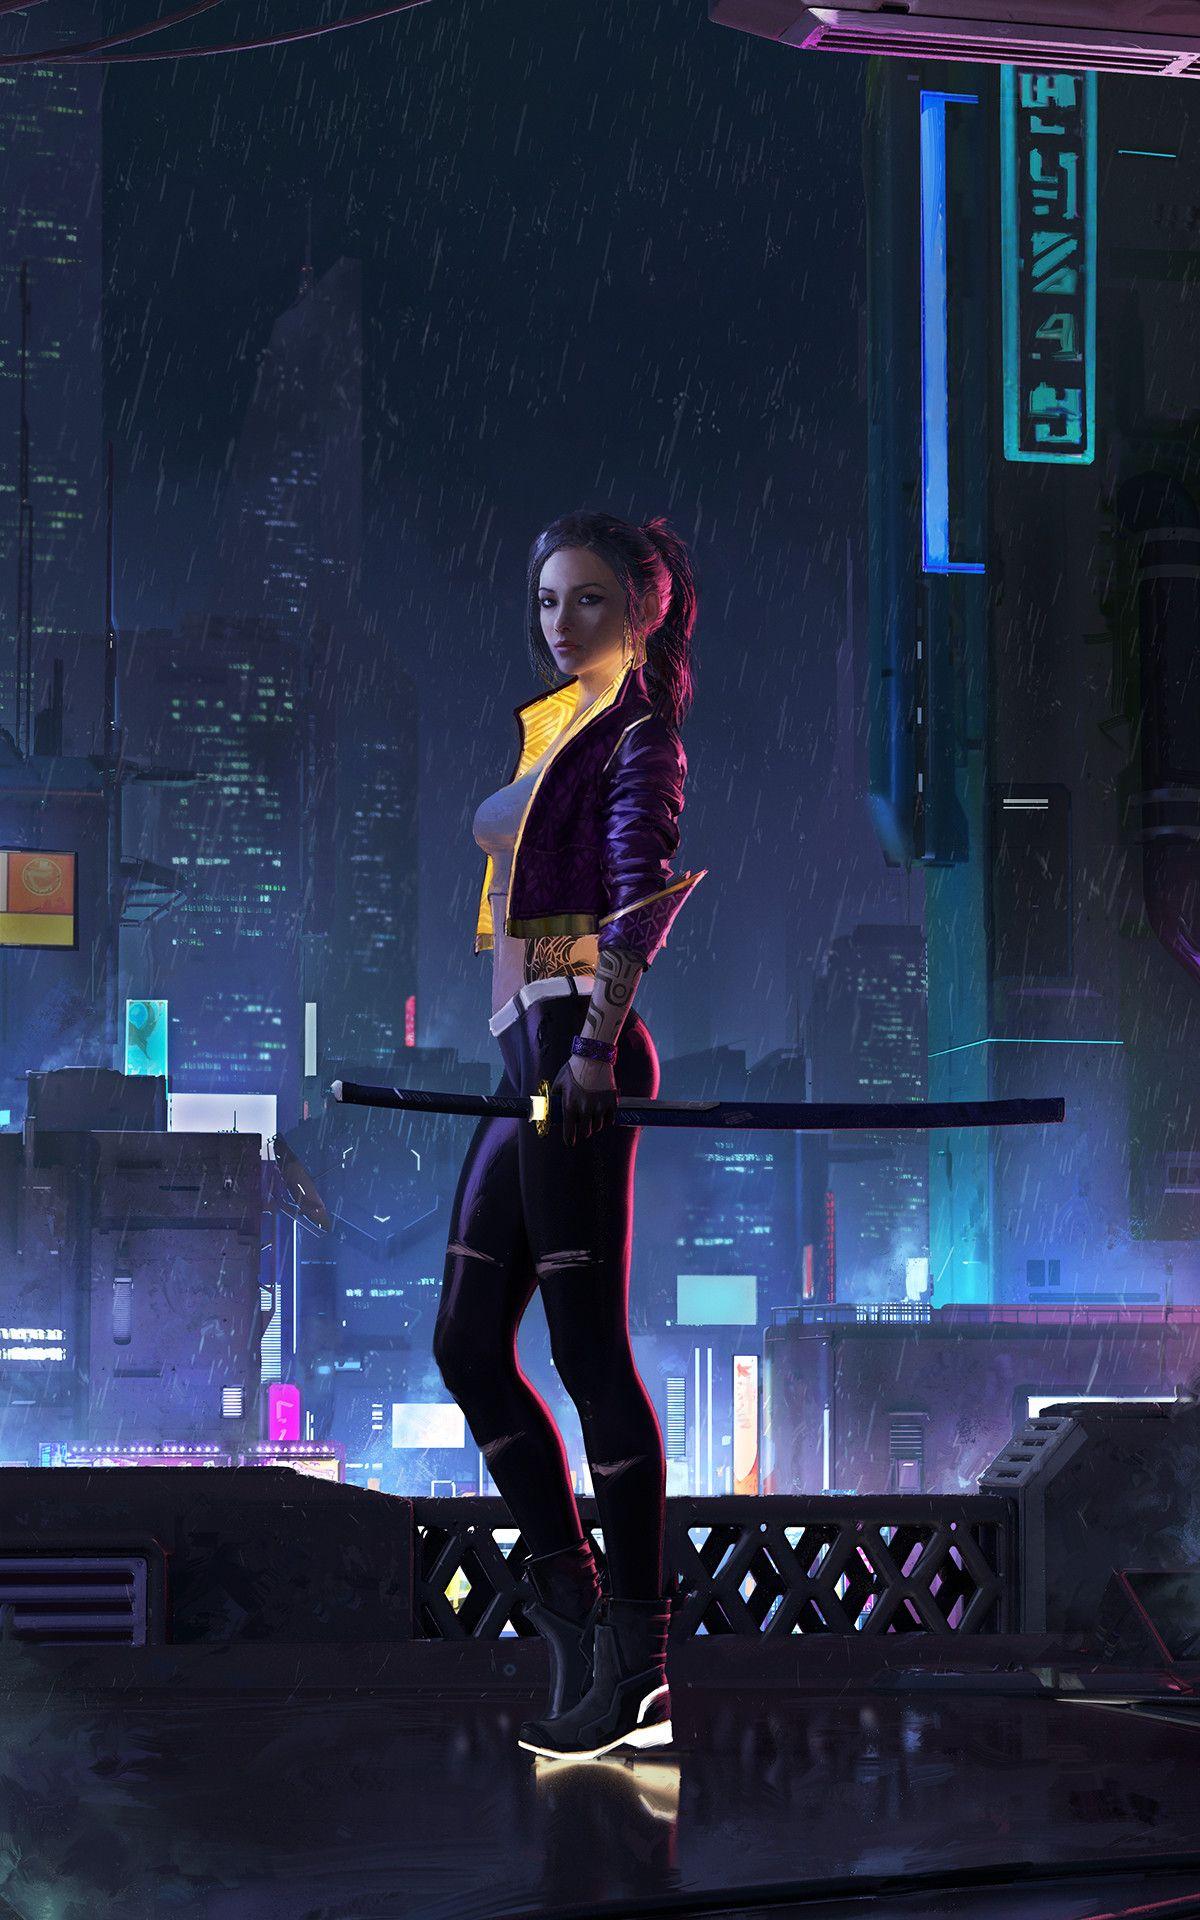 cyberpunk cyberpunkgirl future katana sword art